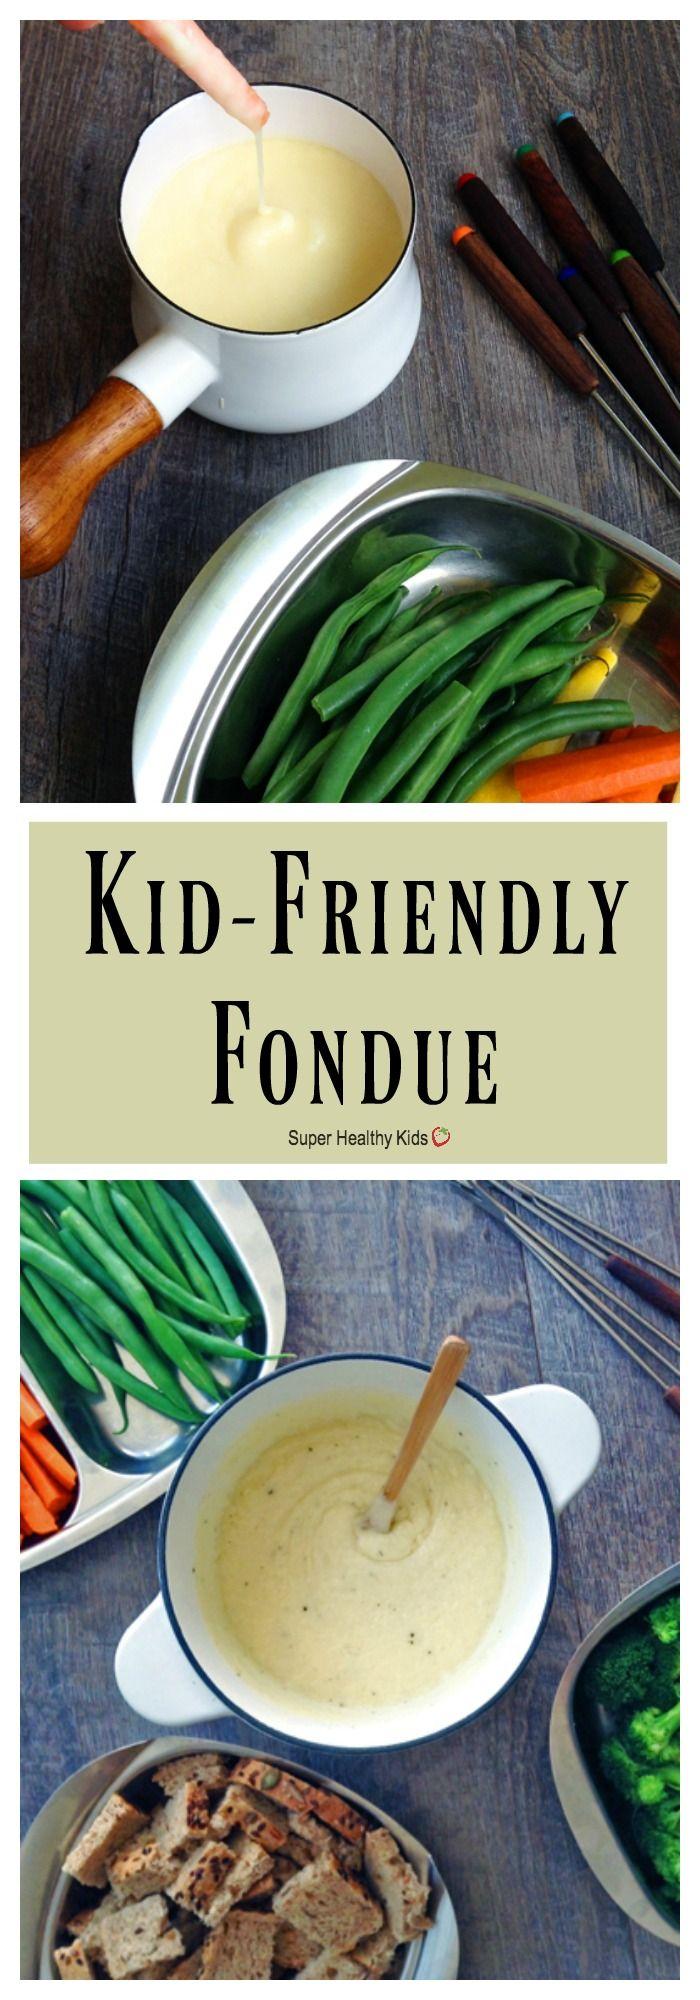 Fun Family Dinner: Cheesy, Wine-Free Fondue!